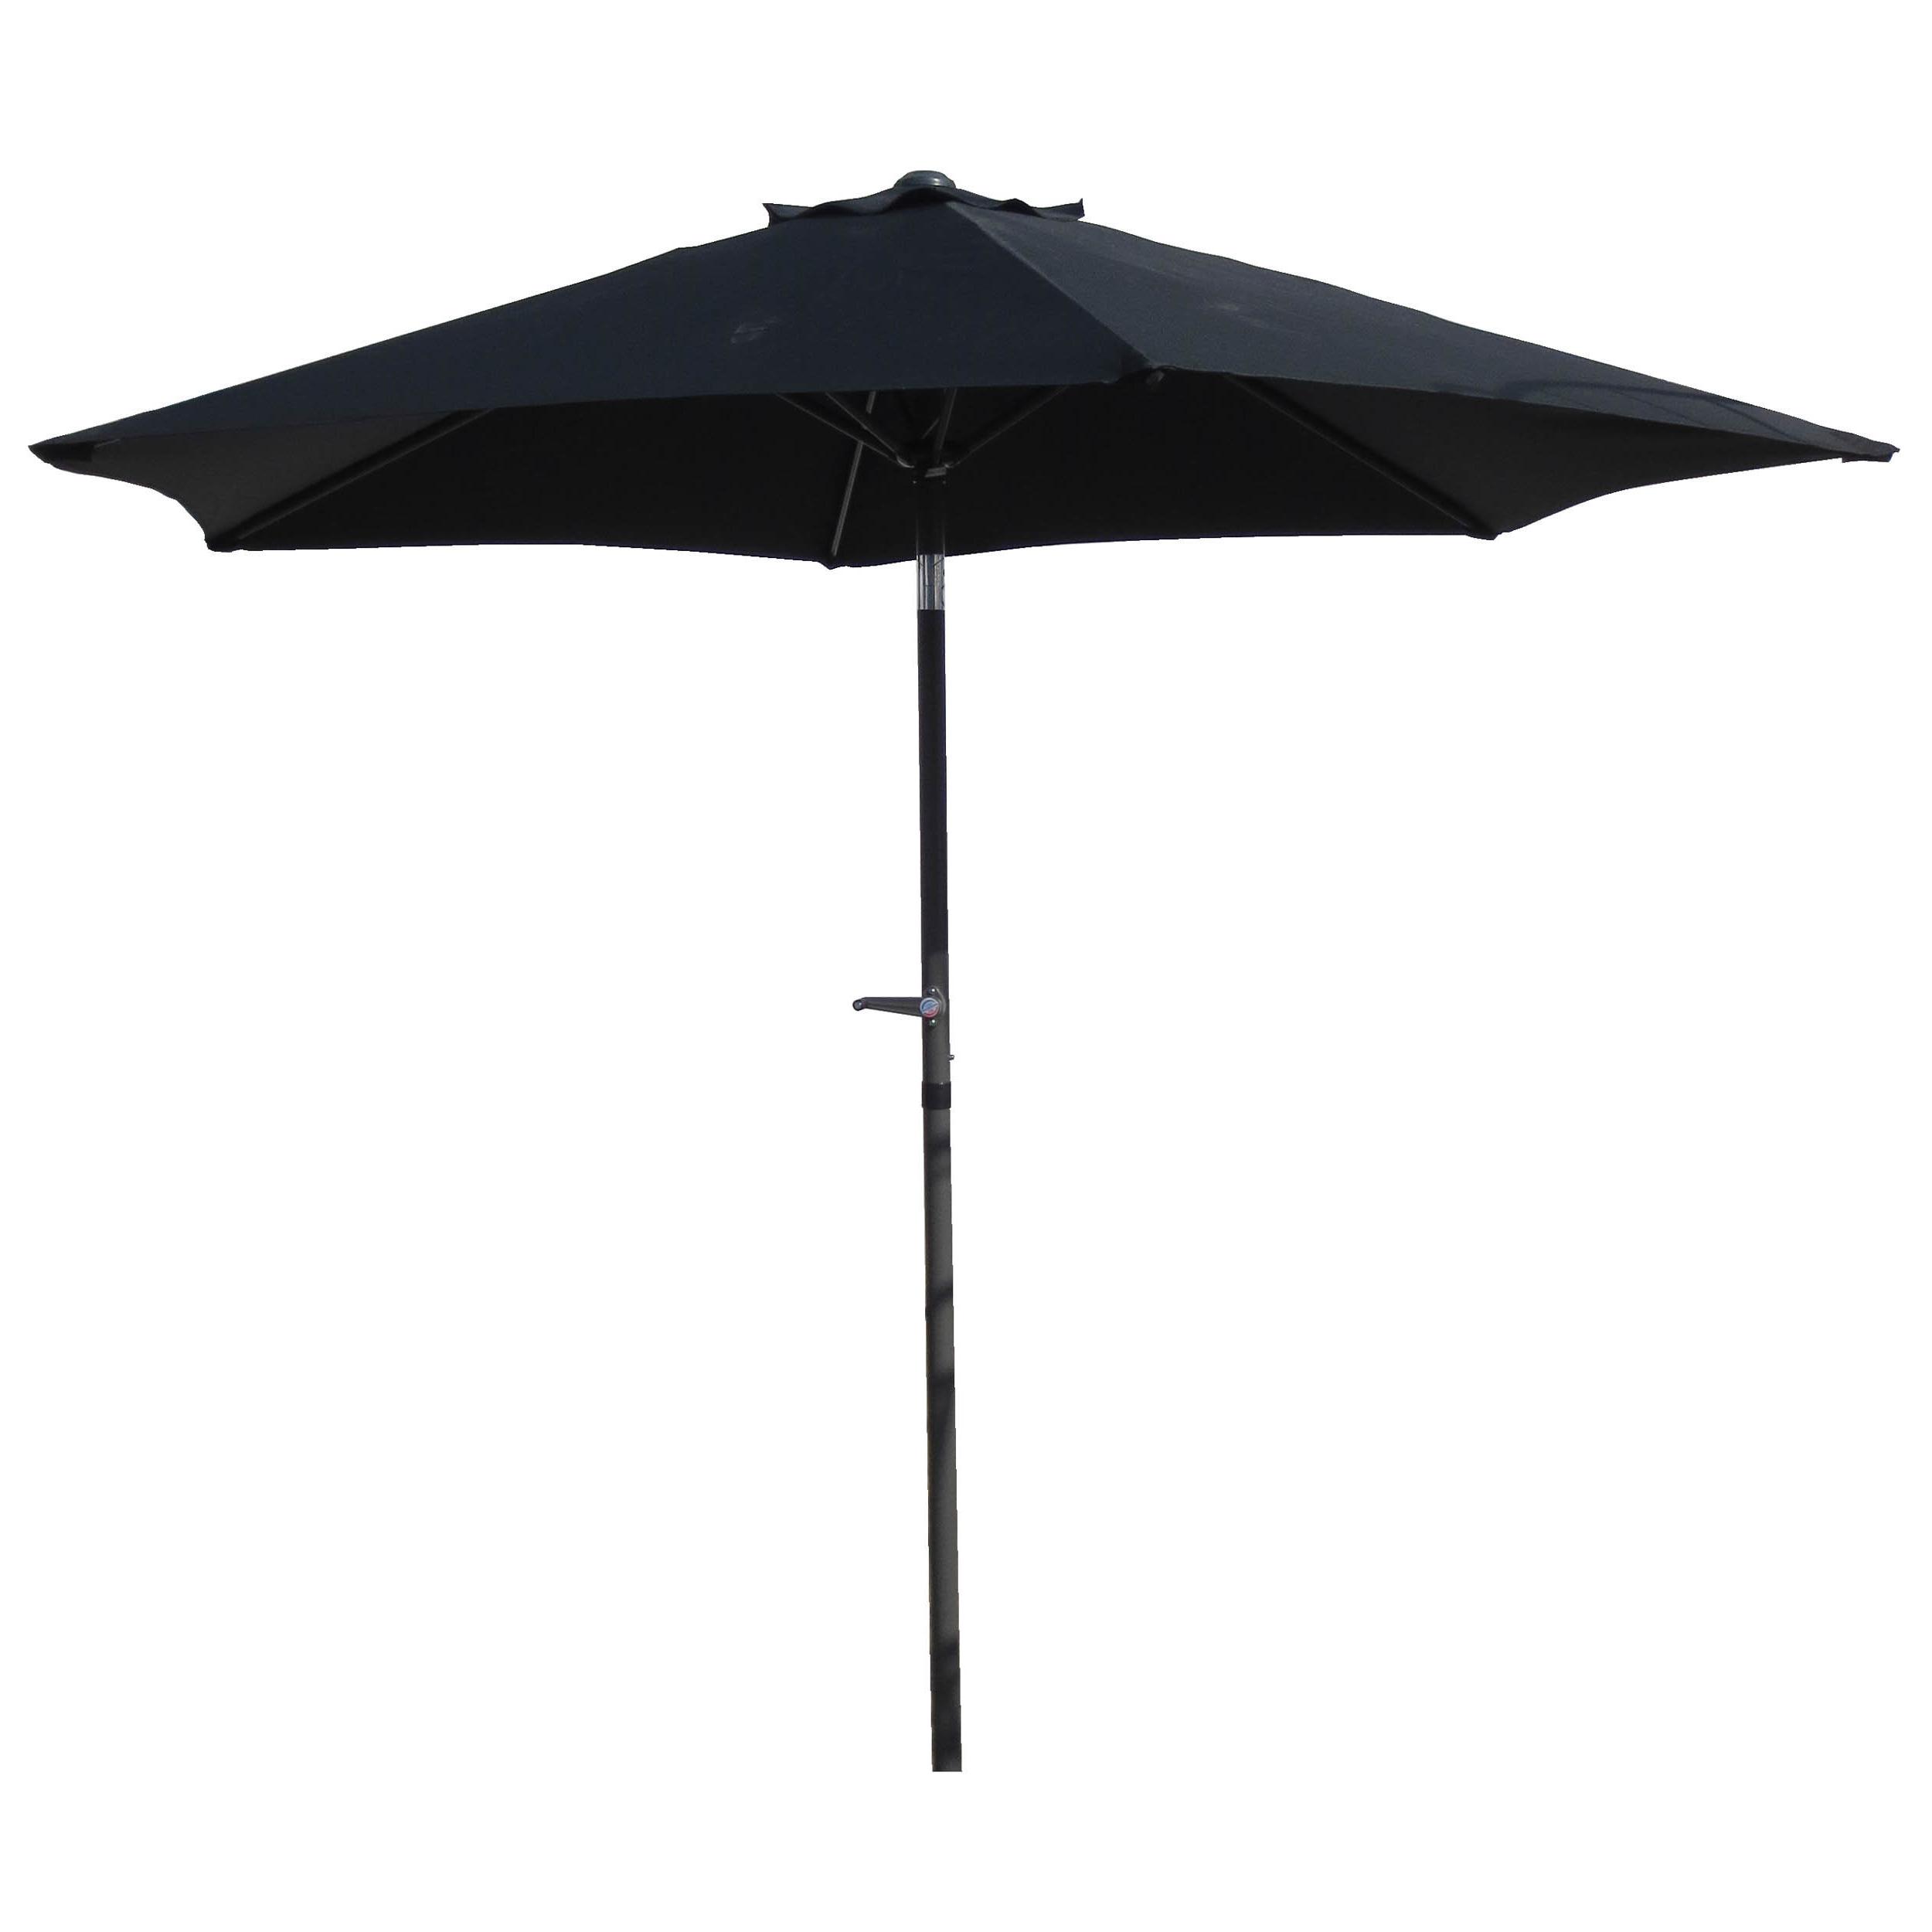 Hyperion Beach Umbrellas In Most Up To Date Brayden Studio Hyperion 8.5' Market Umbrella (Gallery 10 of 20)